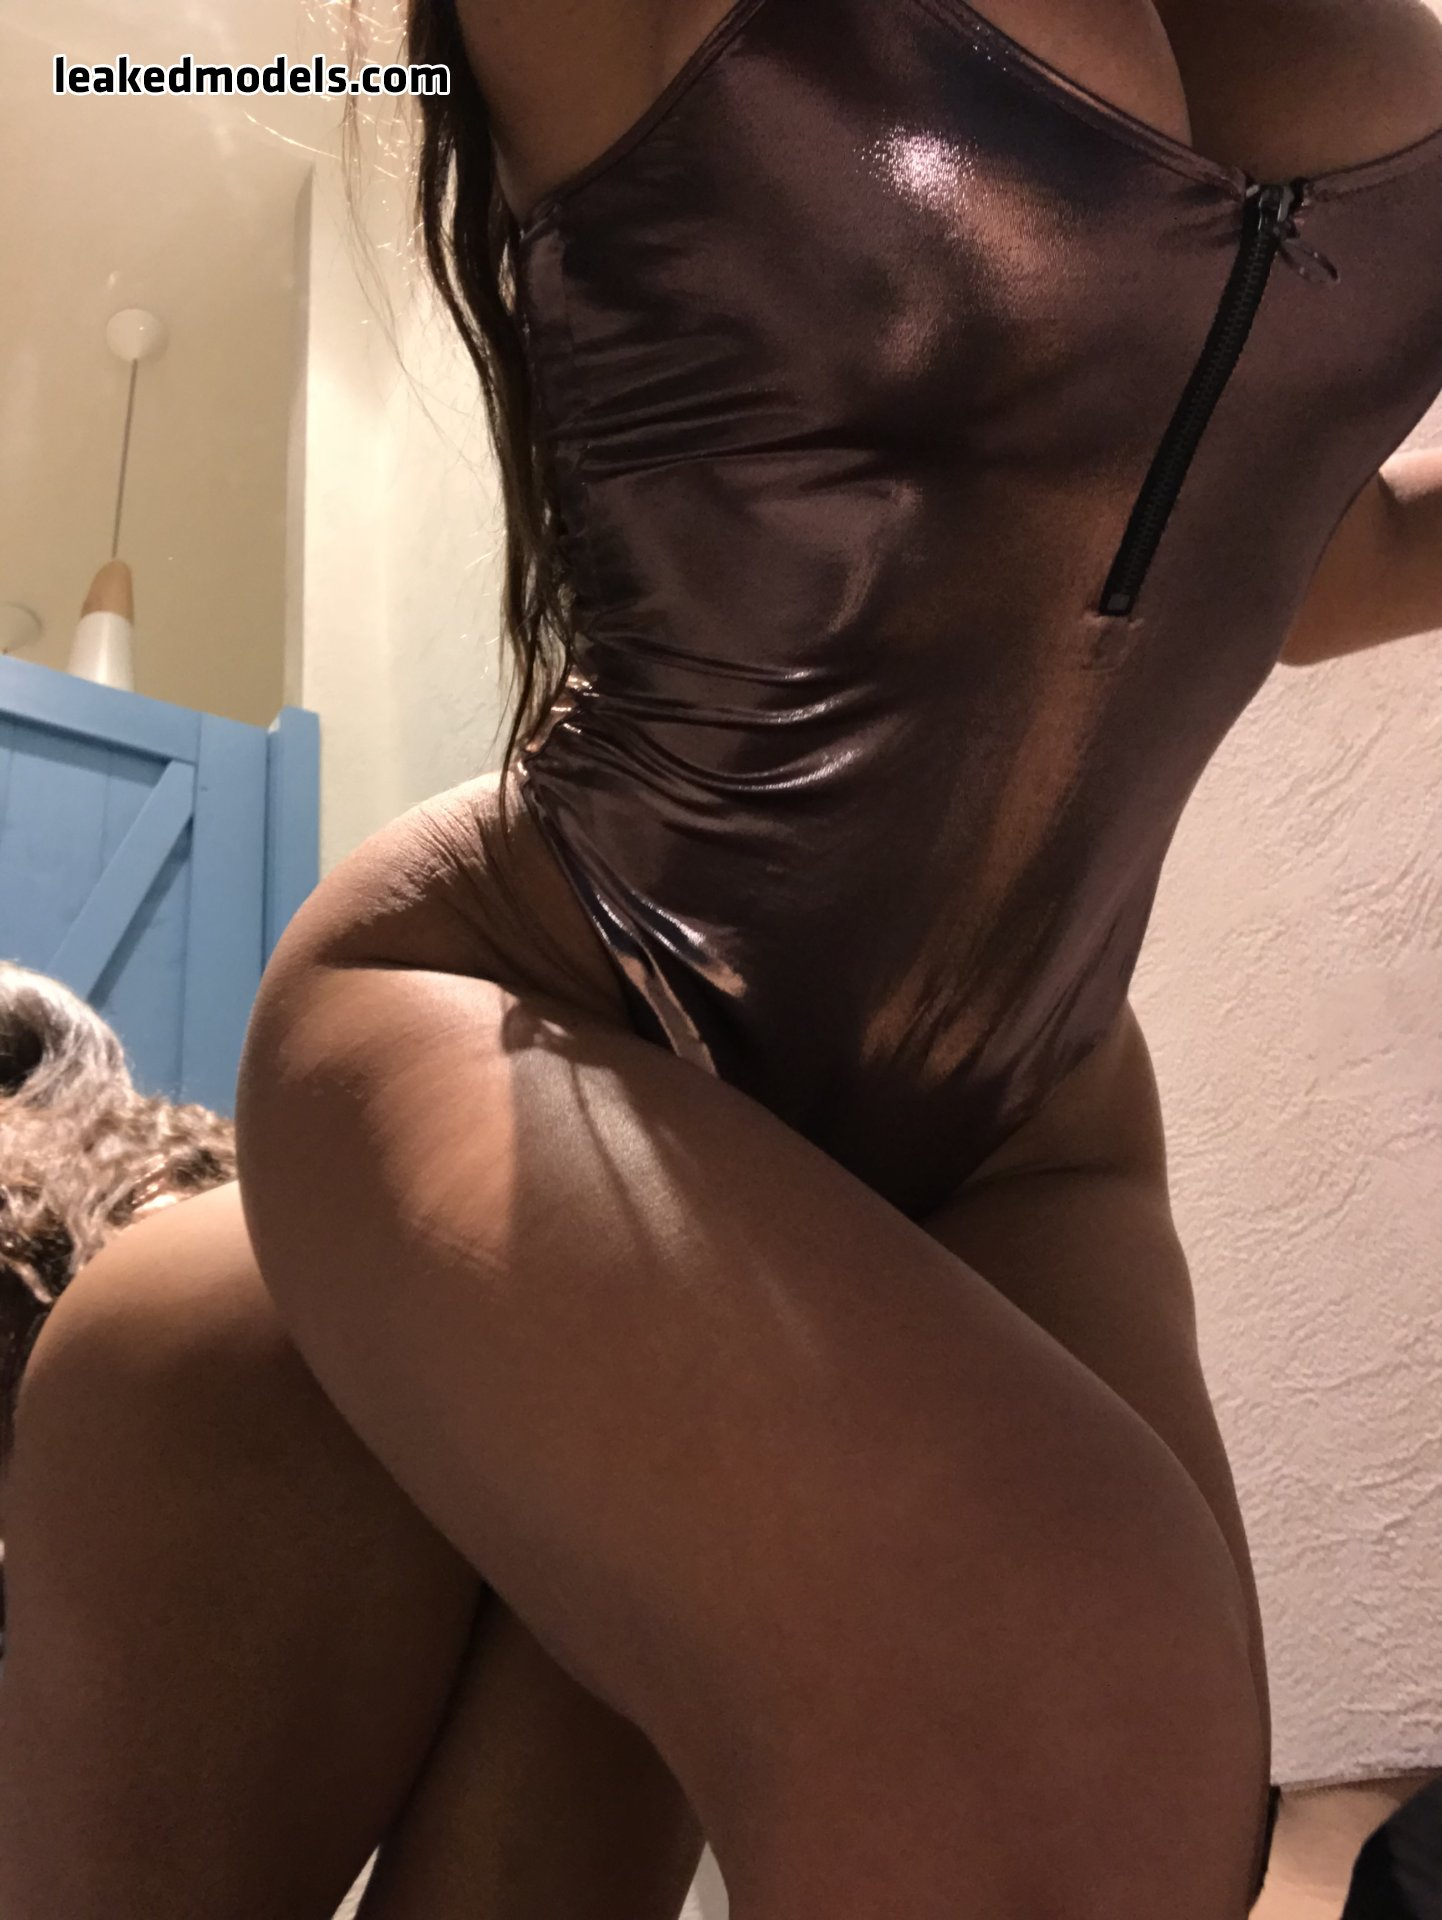 olga seteykina – seteykina OnlyFans Nude Leaks (33 Photos)